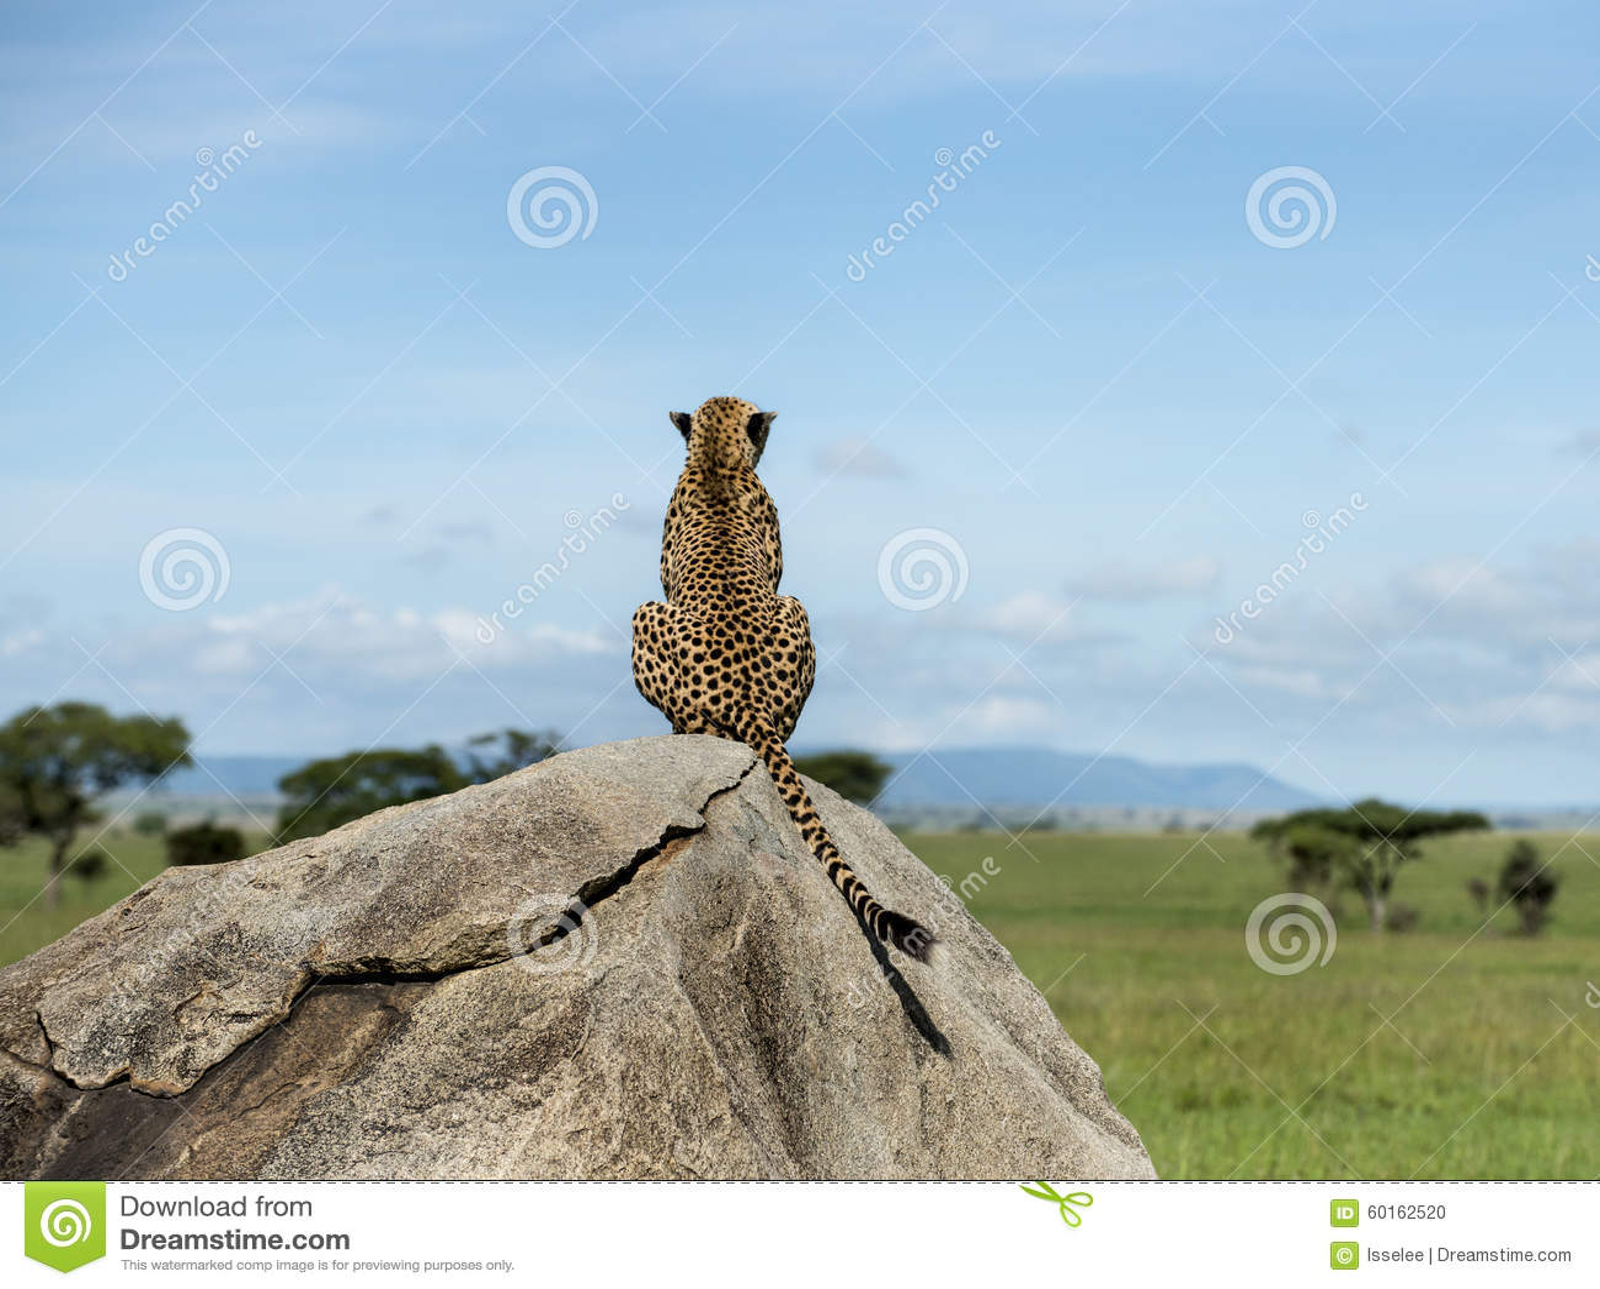 Cheetah sitting on a rock and looking away, Serengeti